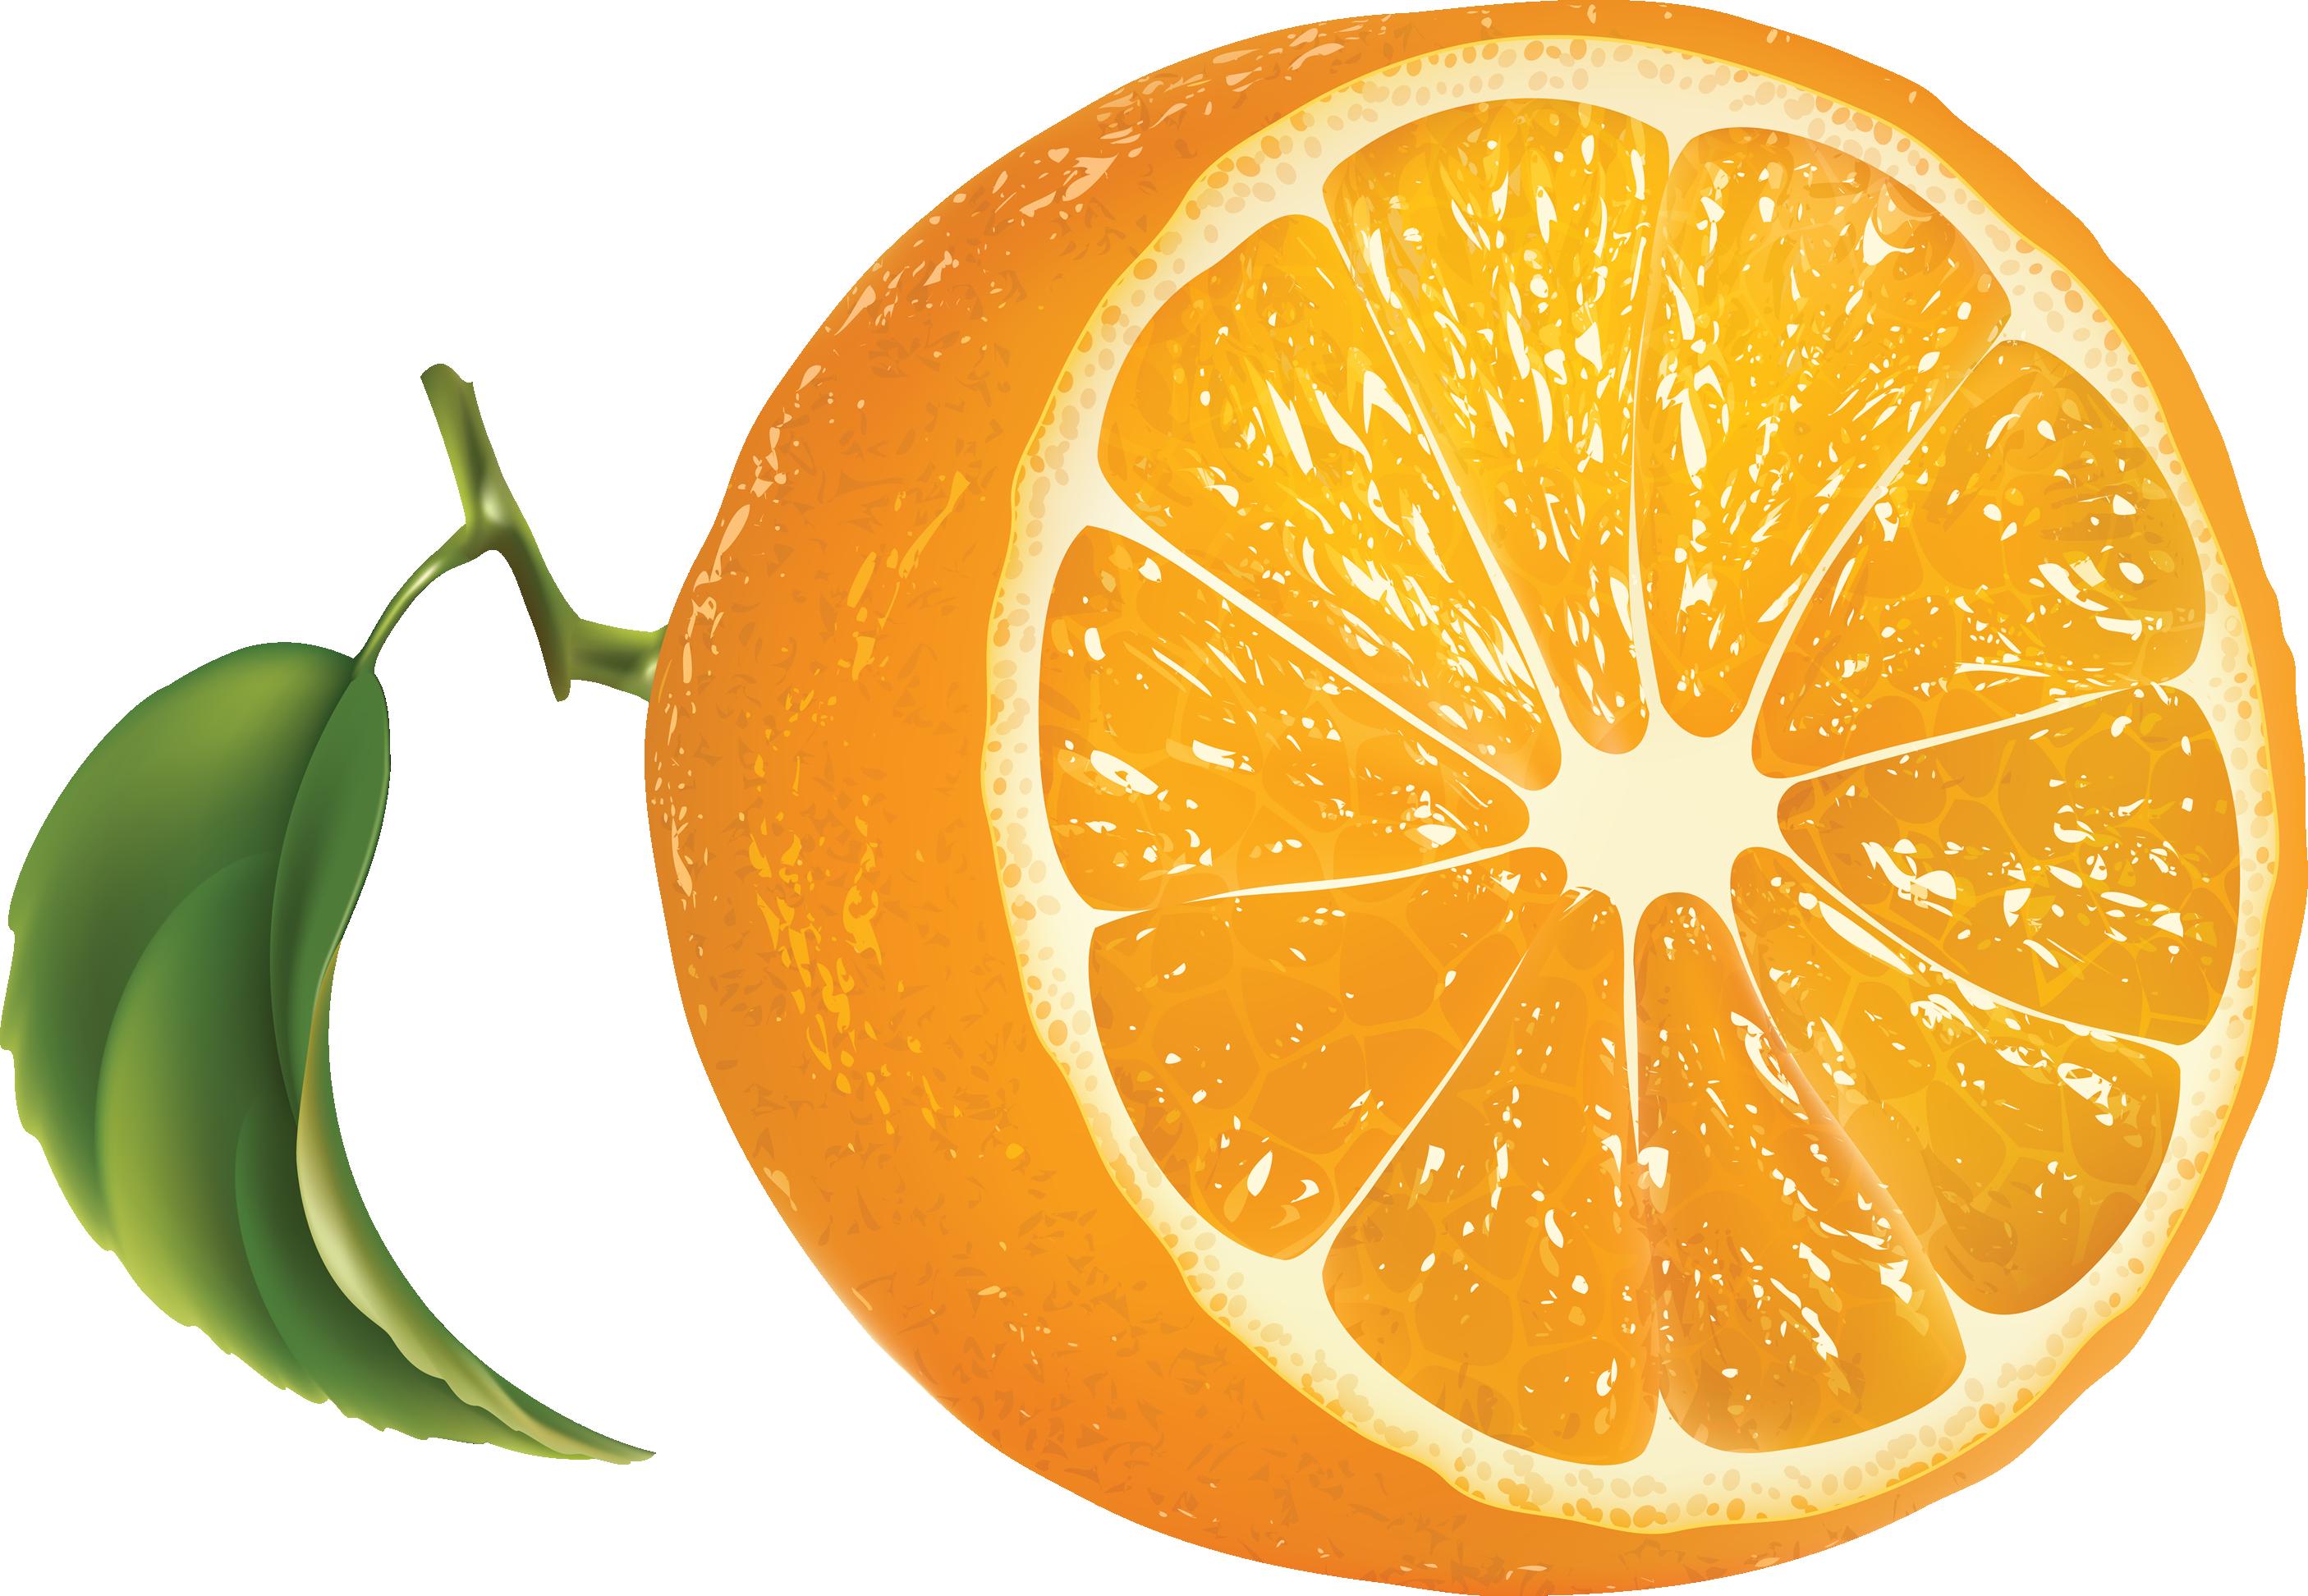 Orange png image purepng. Library clipart transparent